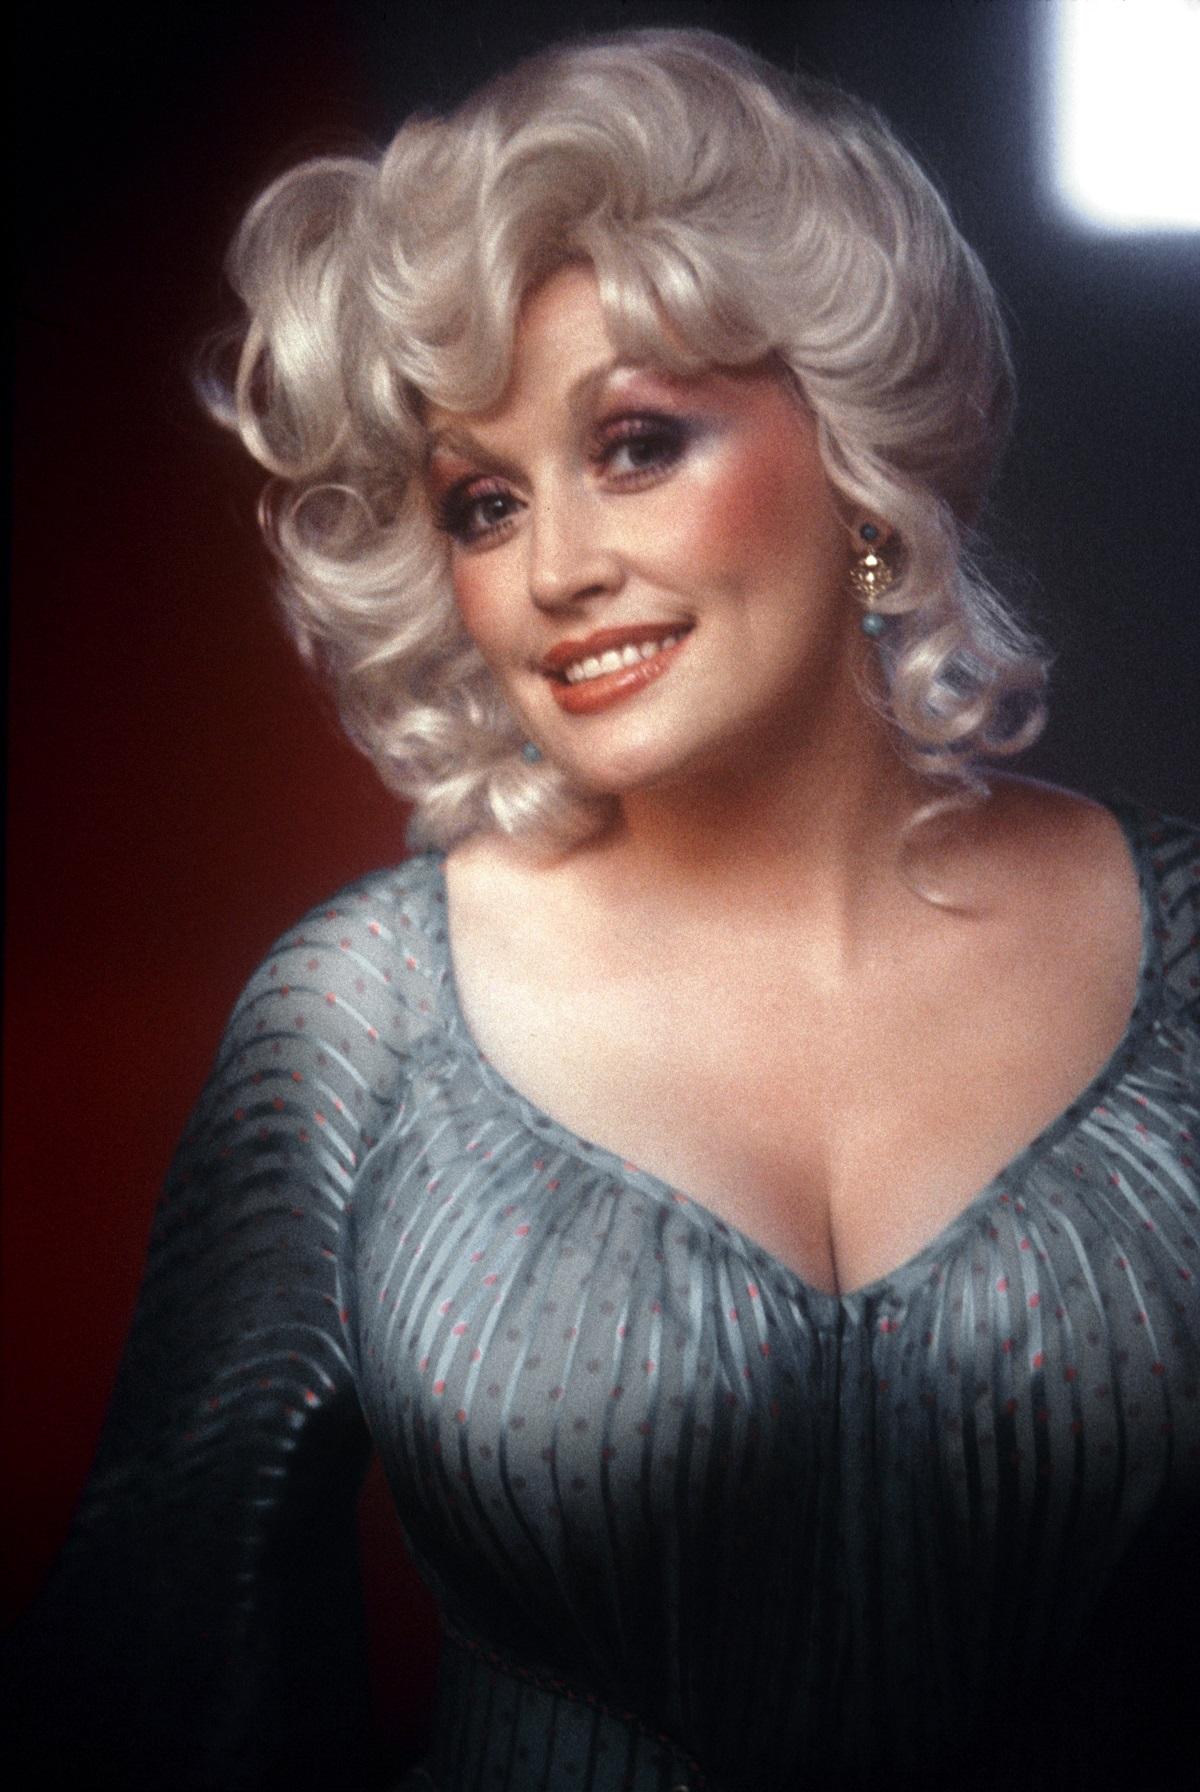 Dolly Parton set to star in festive Netflix film